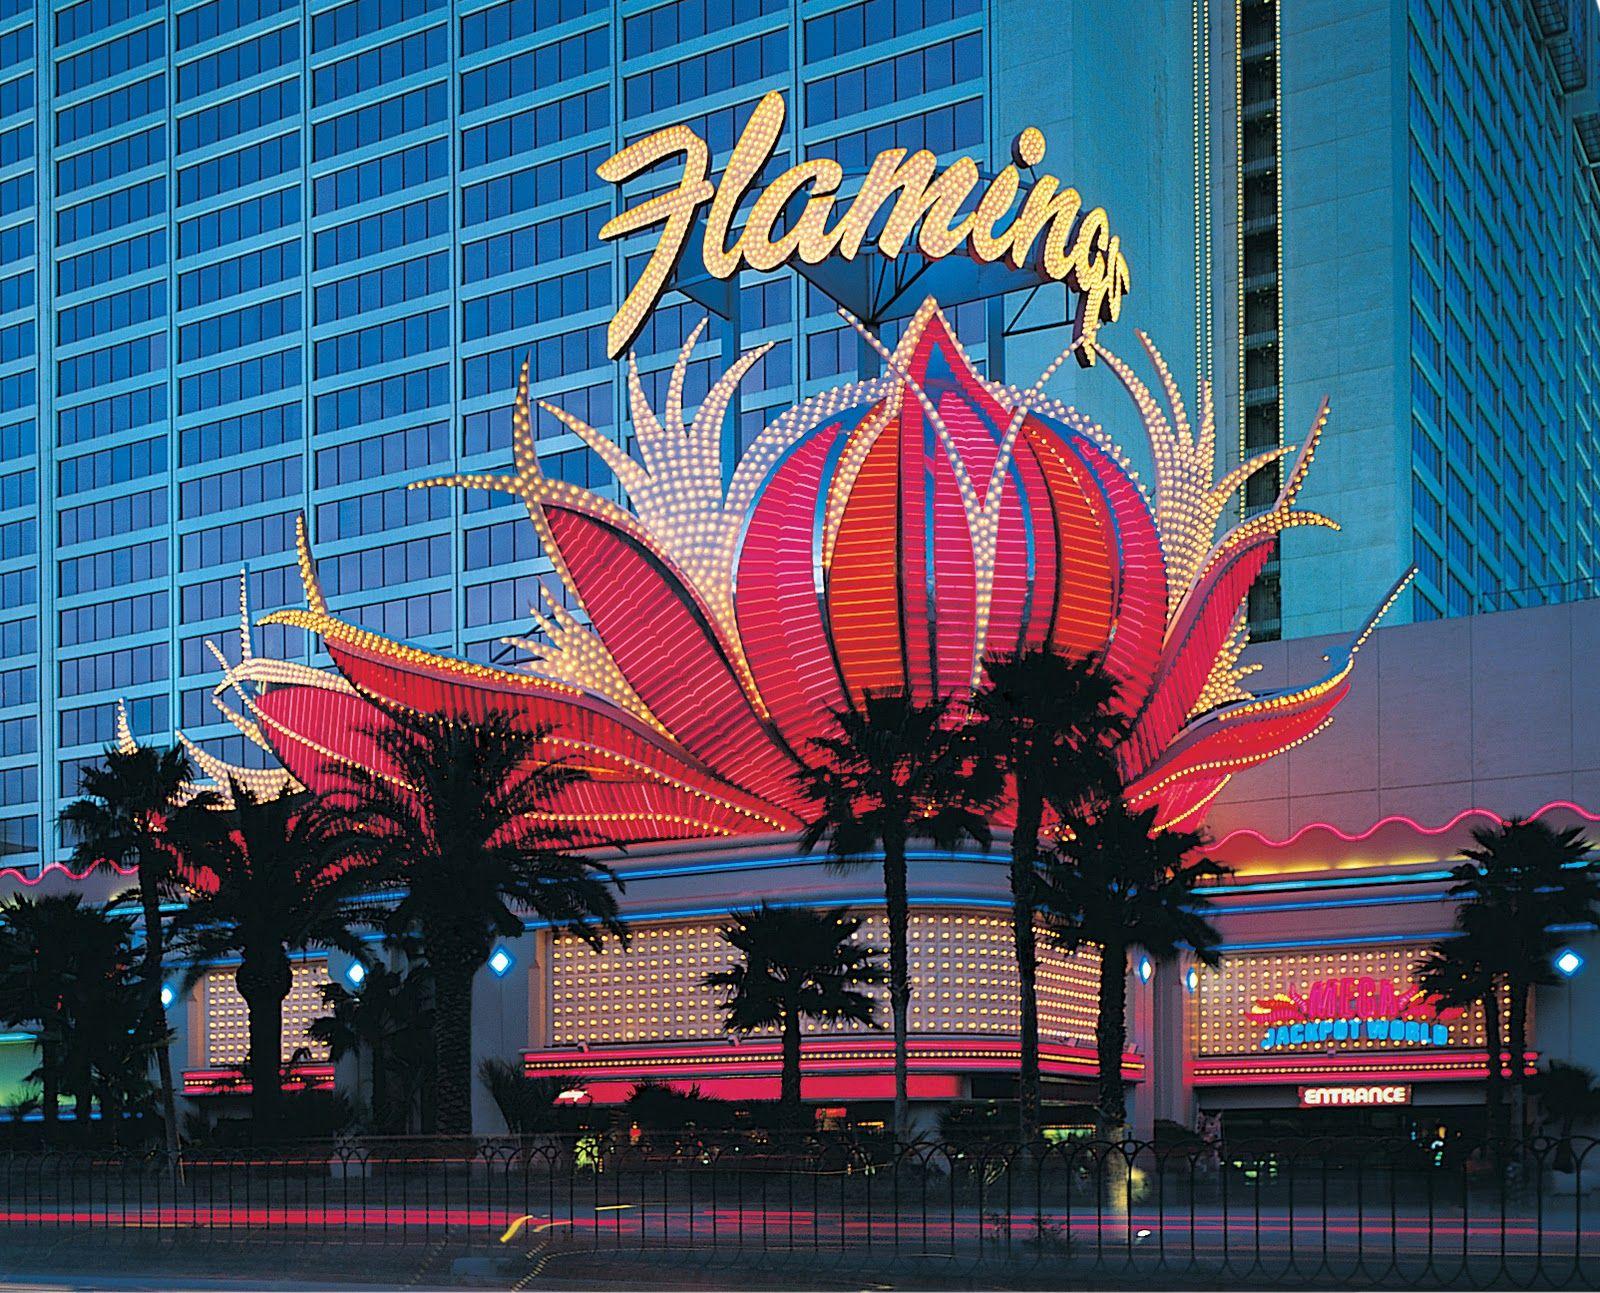 Casino european flamingo roulette marketing in casino